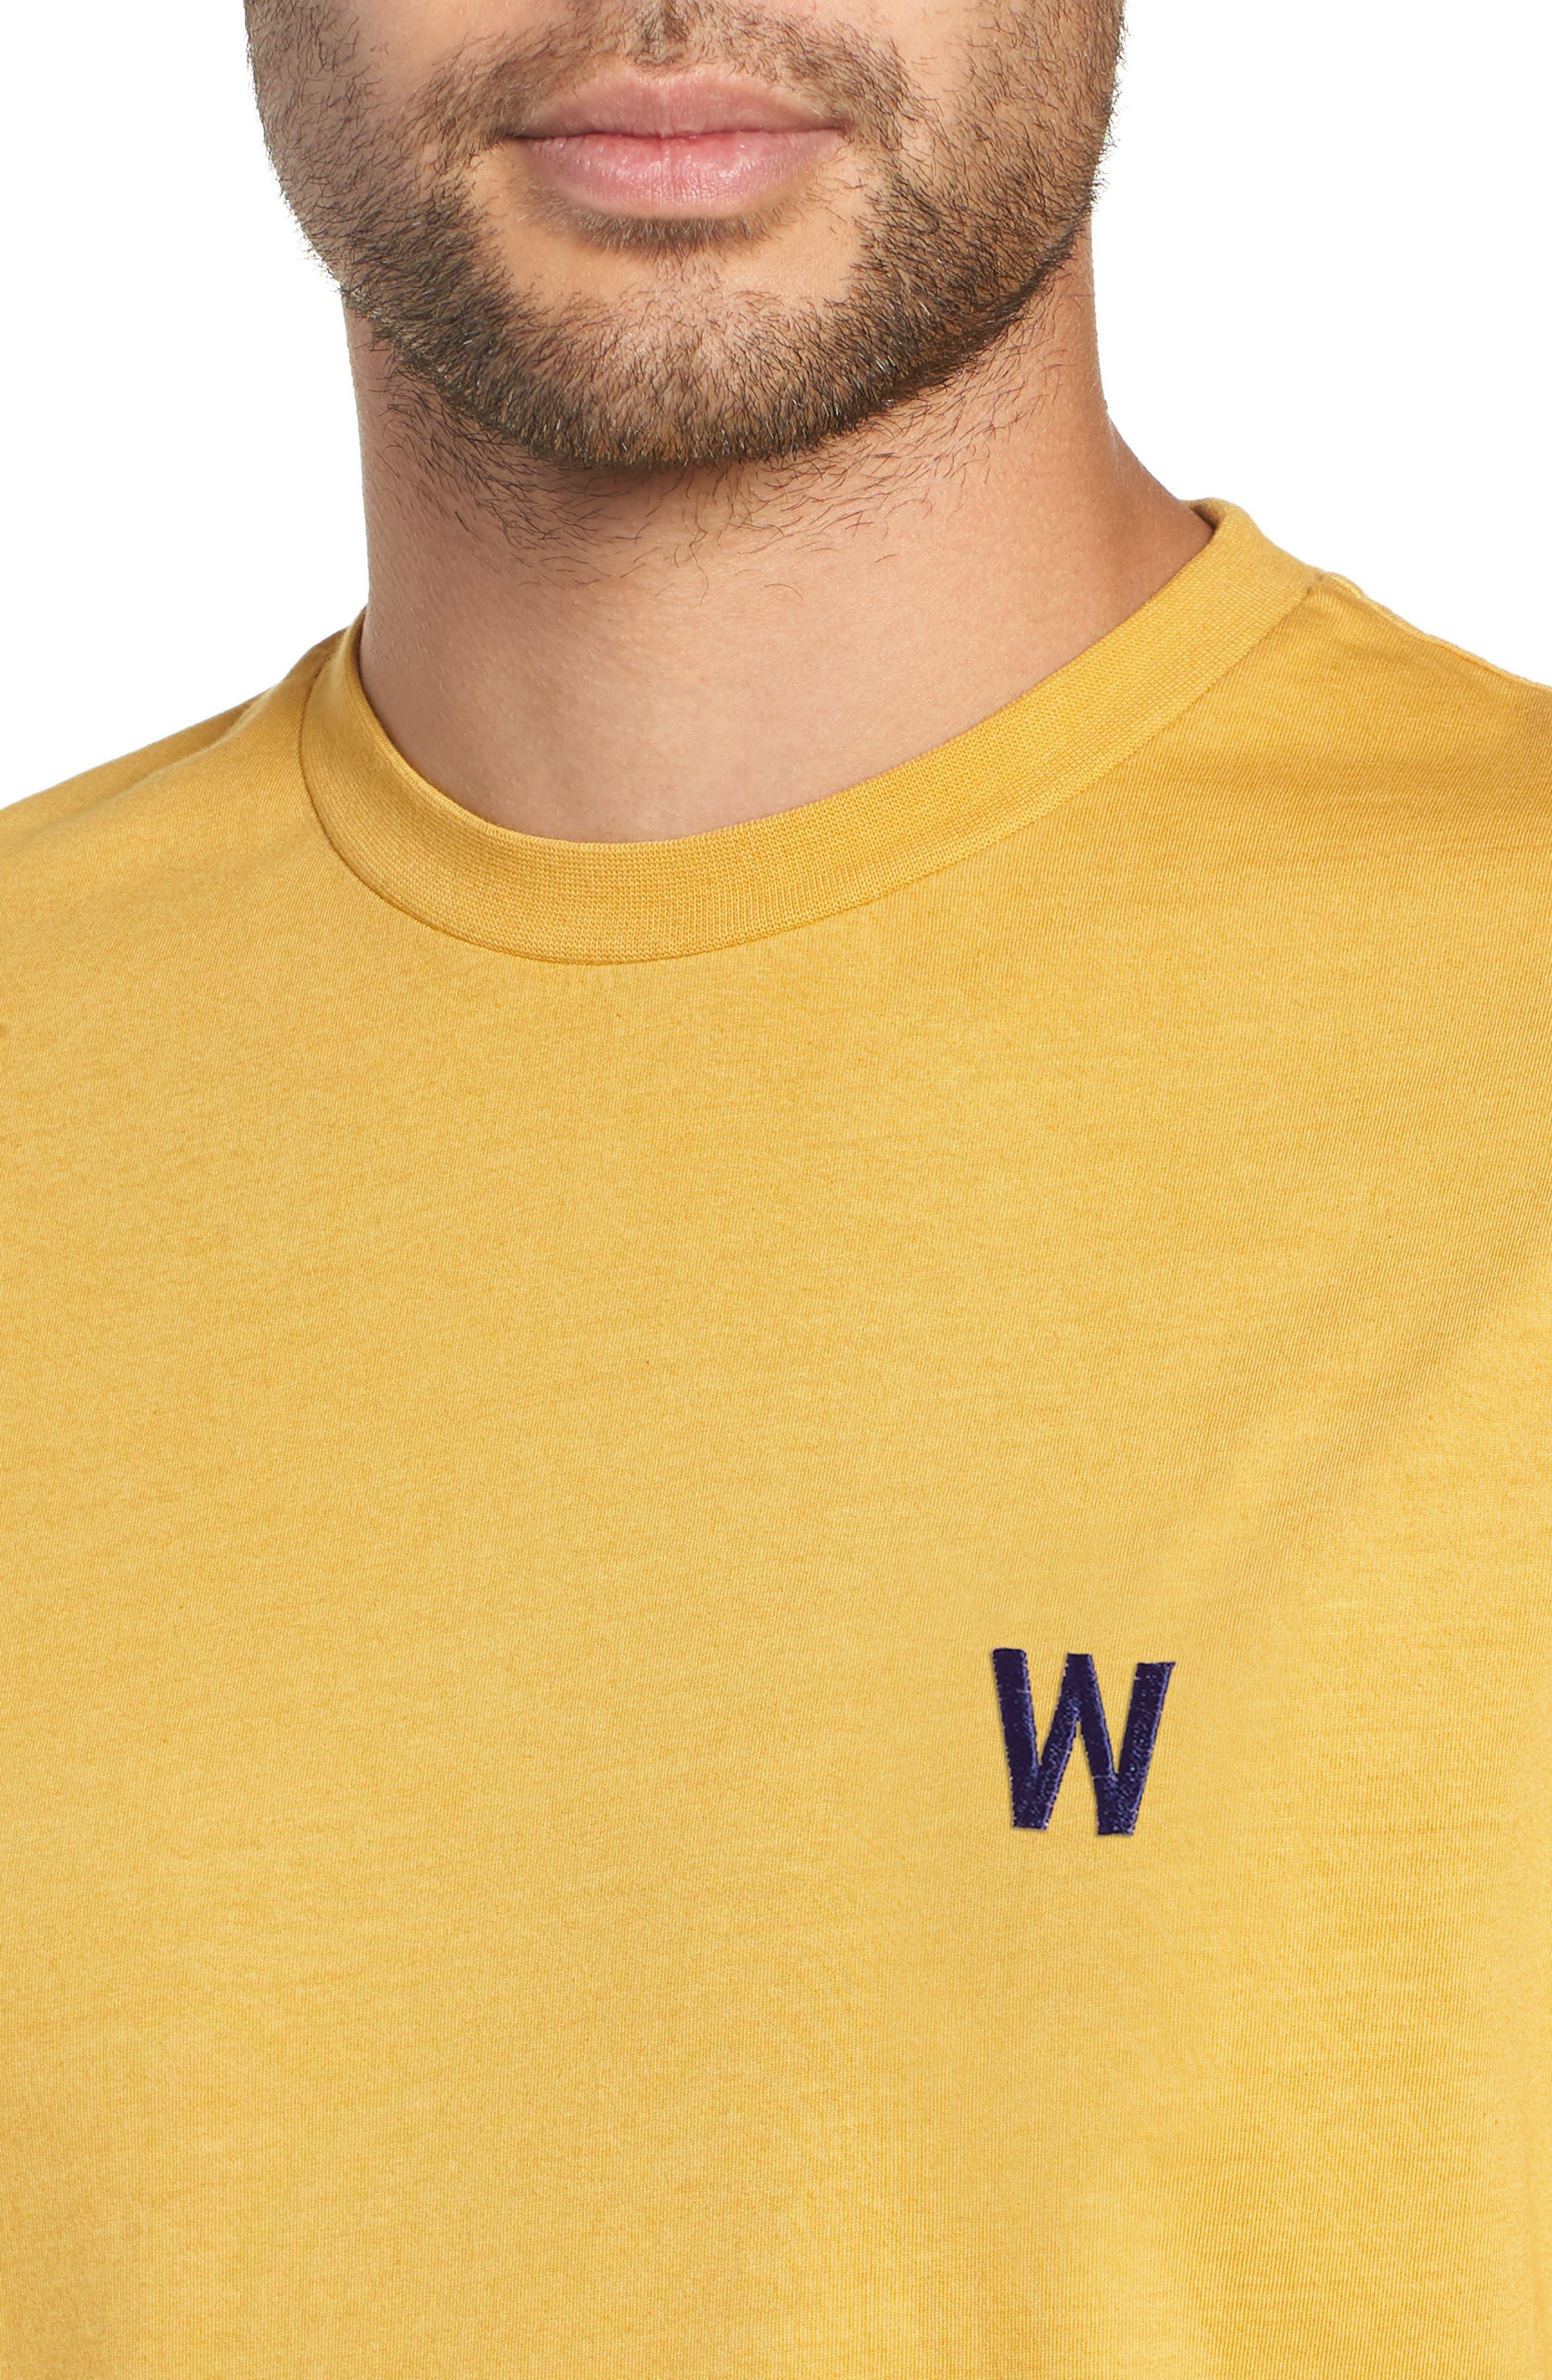 Reid T-Shirt,                             Alternate thumbnail 4, color,                             LEMON